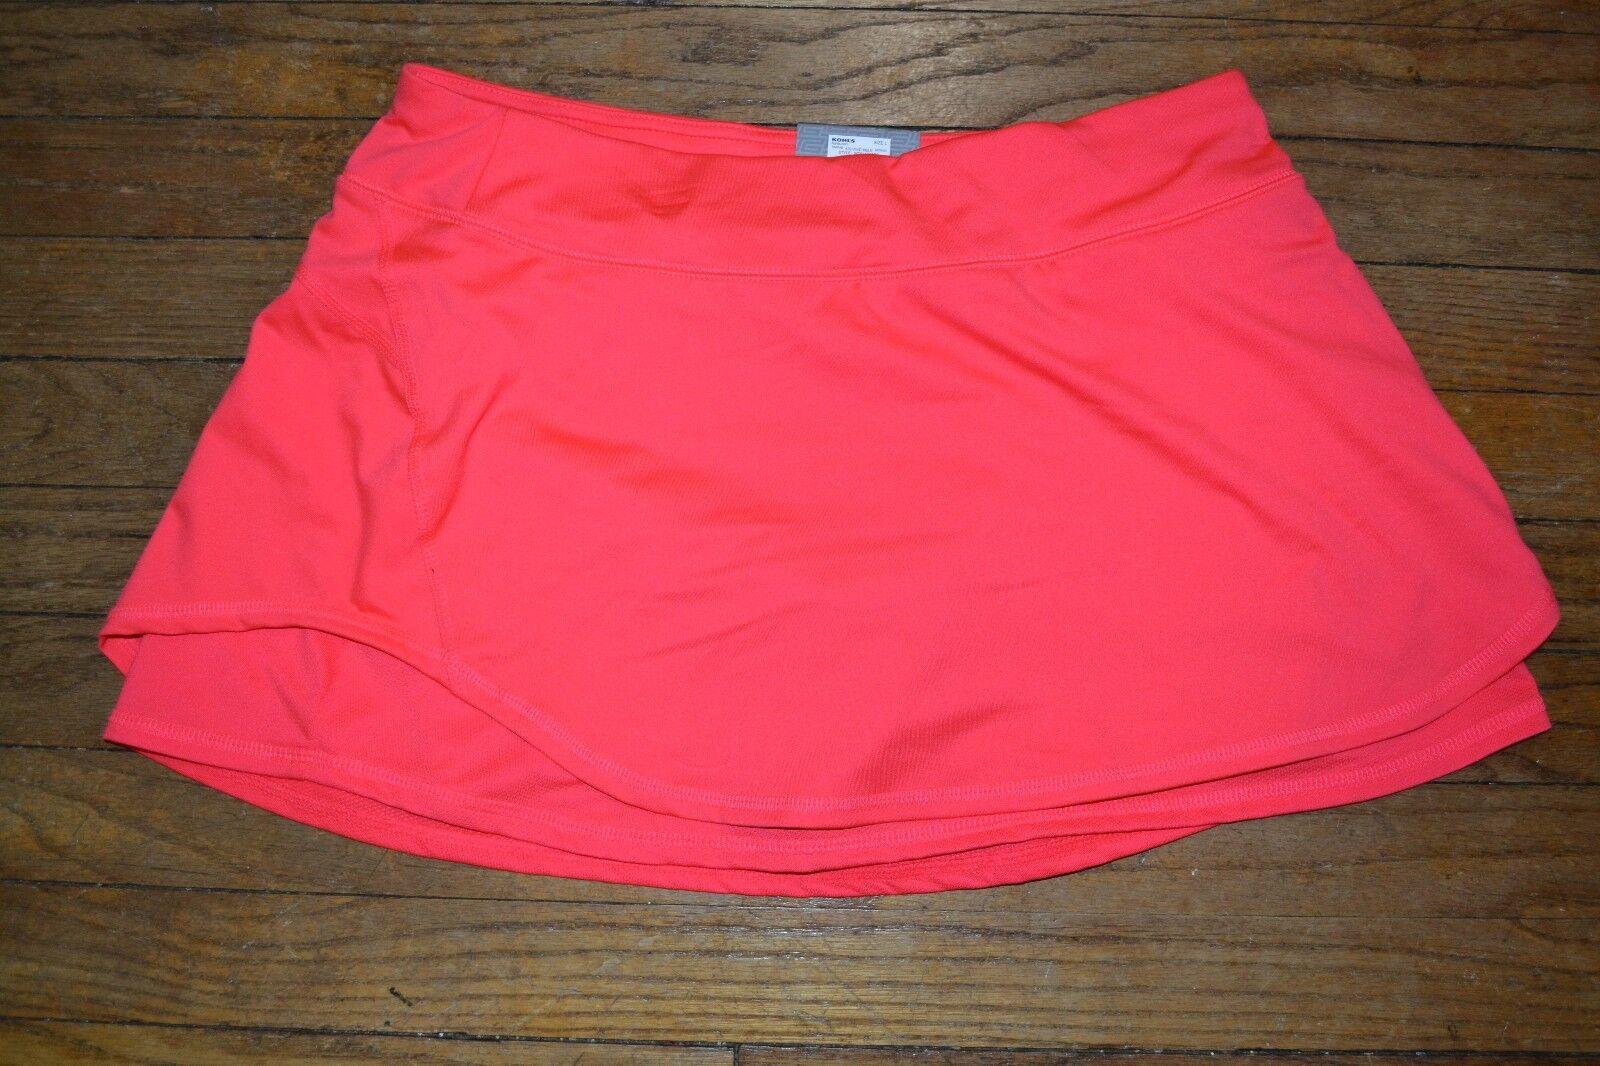 melon skort athletic shorts w skirt performance